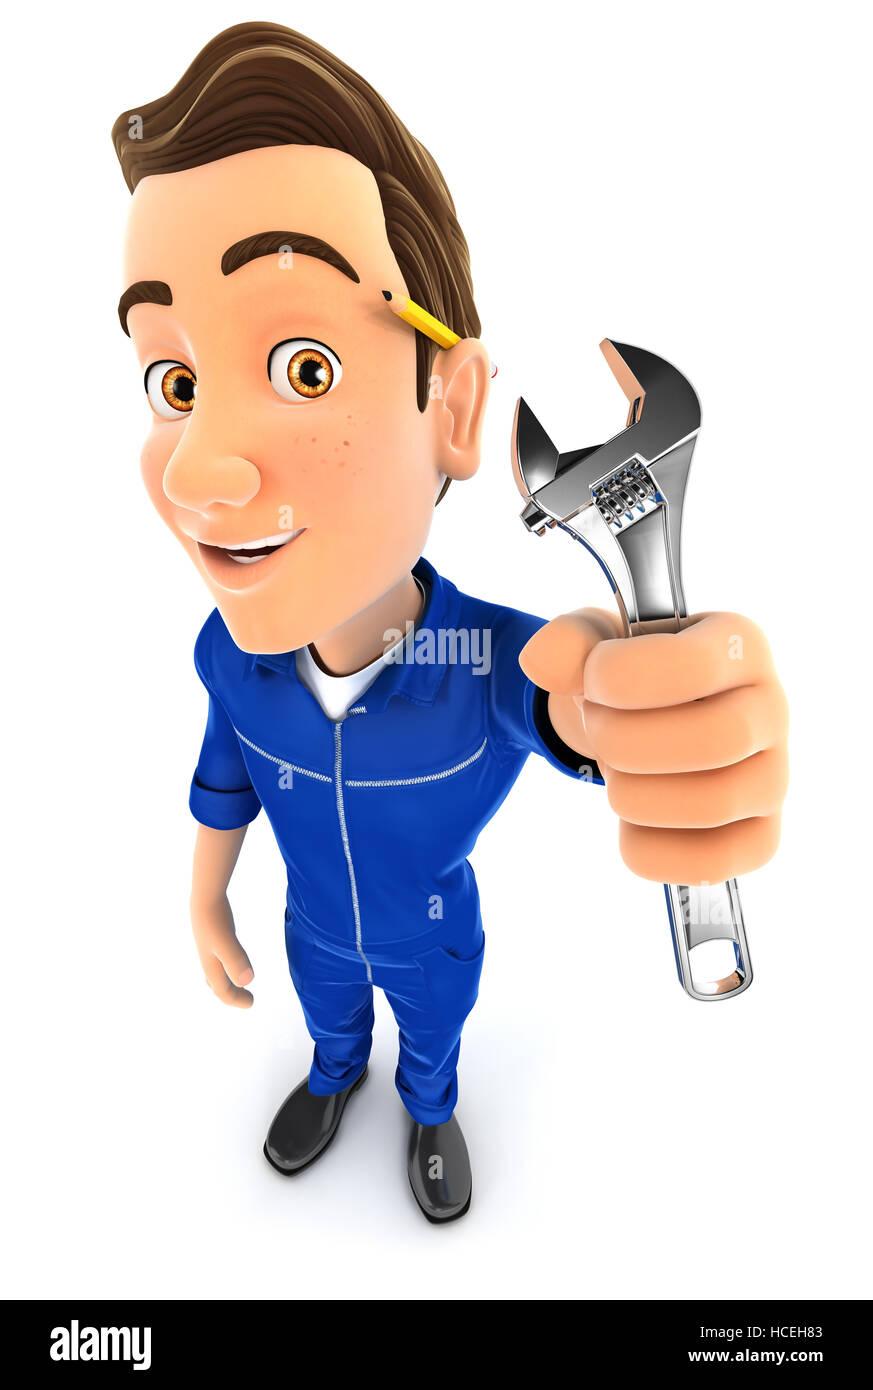 3d mechanic holding adjustable wrench, illustration with isolated white background Stock Photo